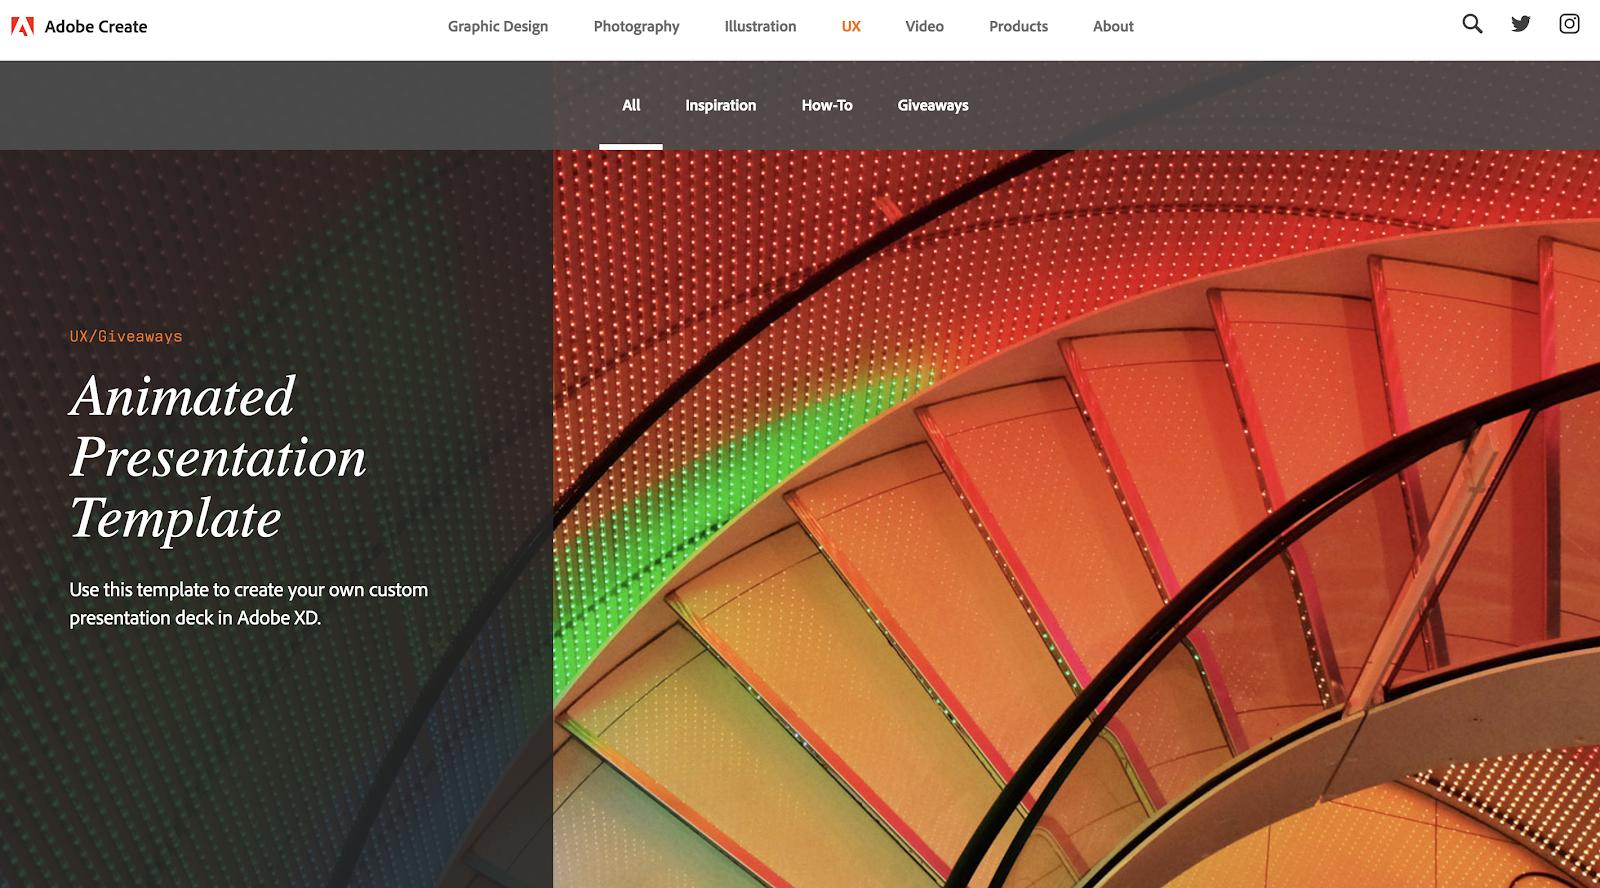 Adobe Create Blog Imagery Examples (Screenshot)